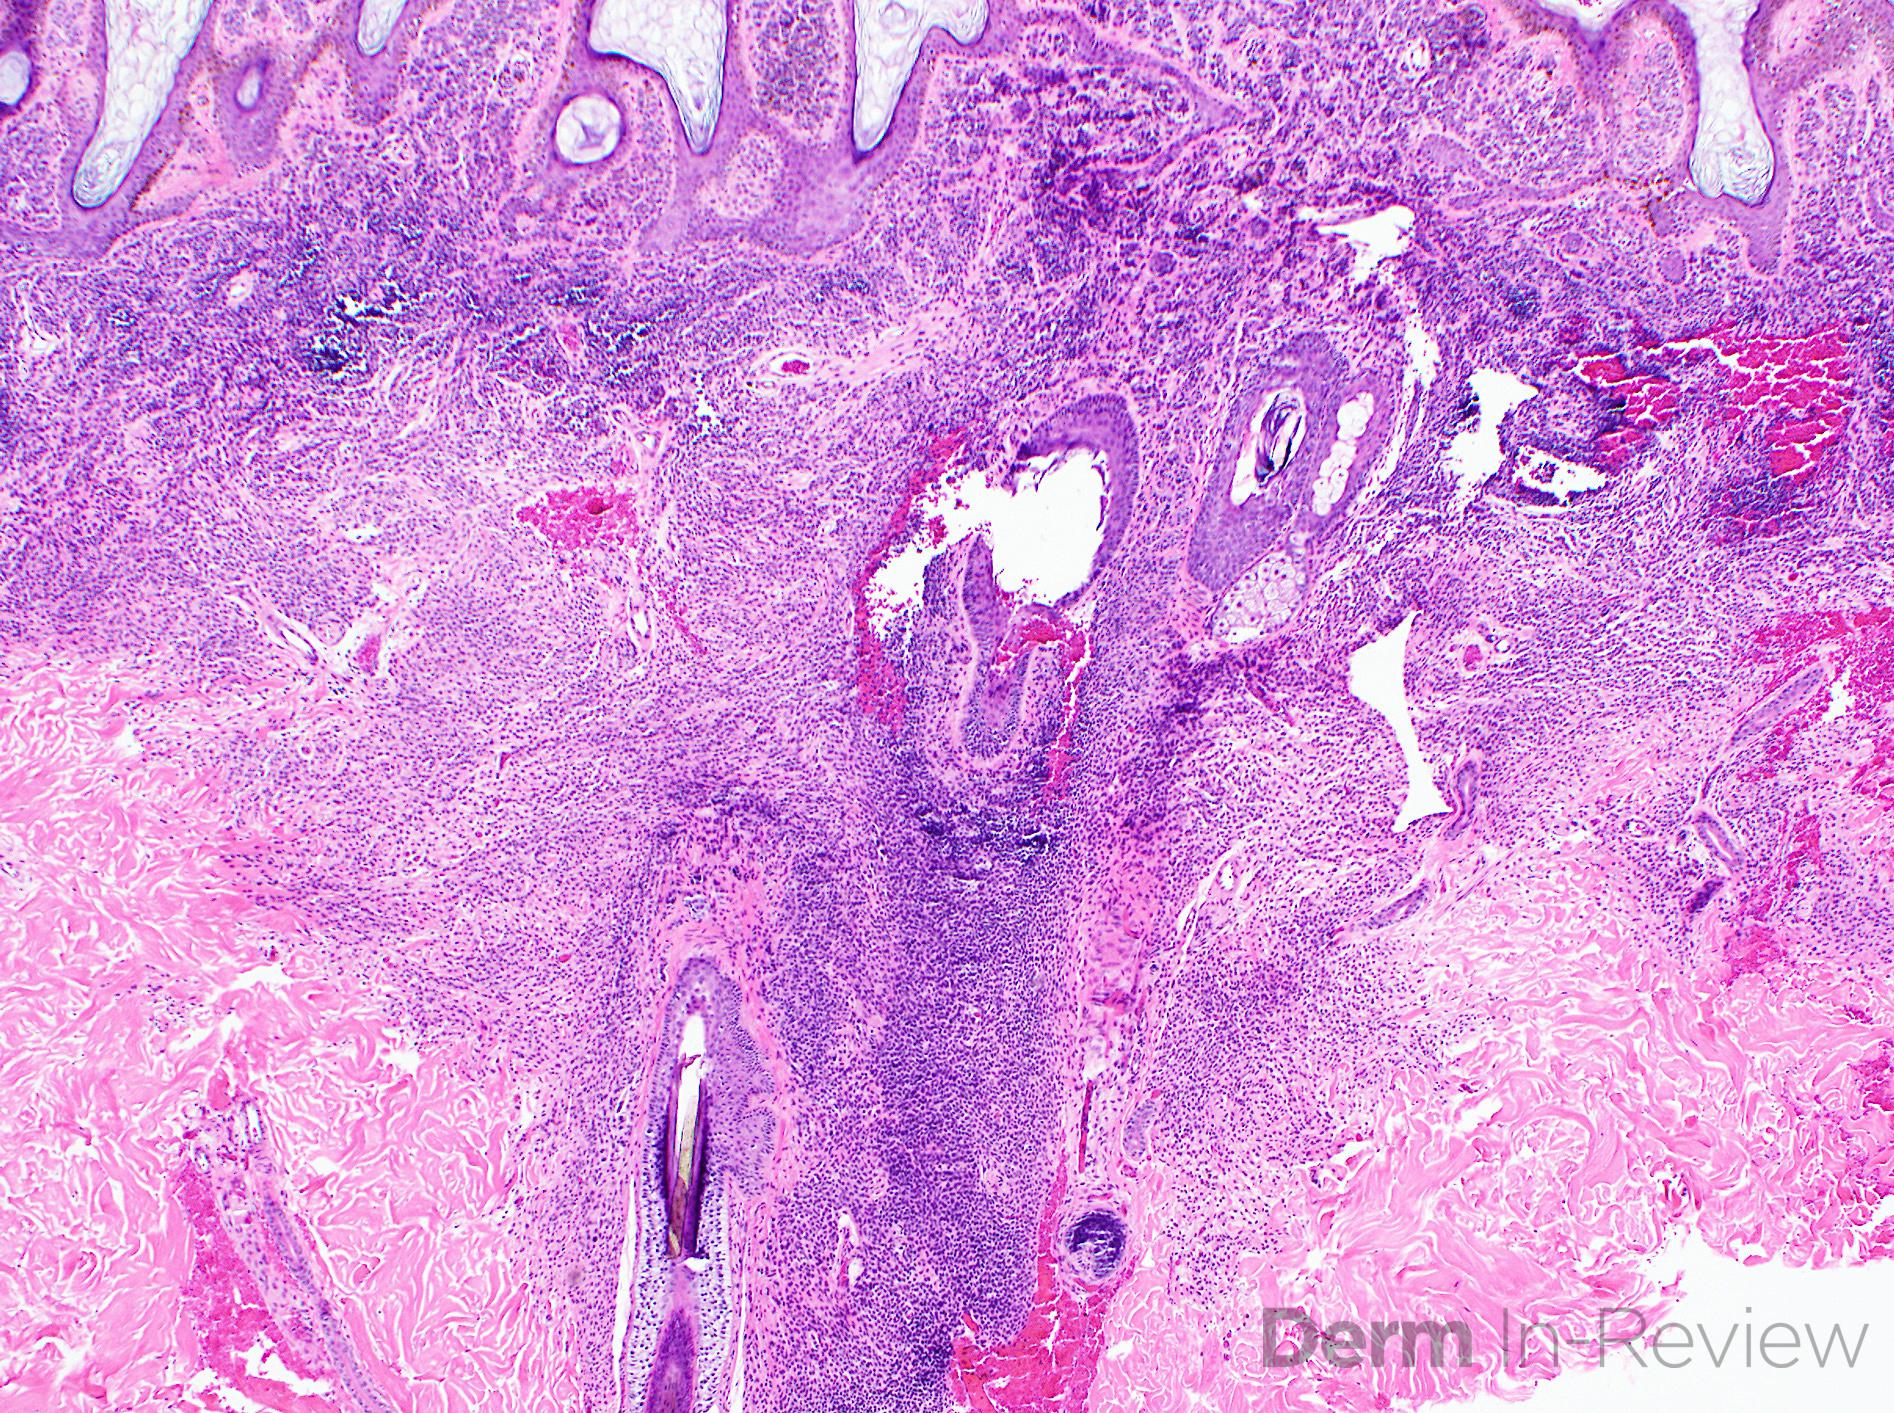 12.2B congenital melanocytic nevus